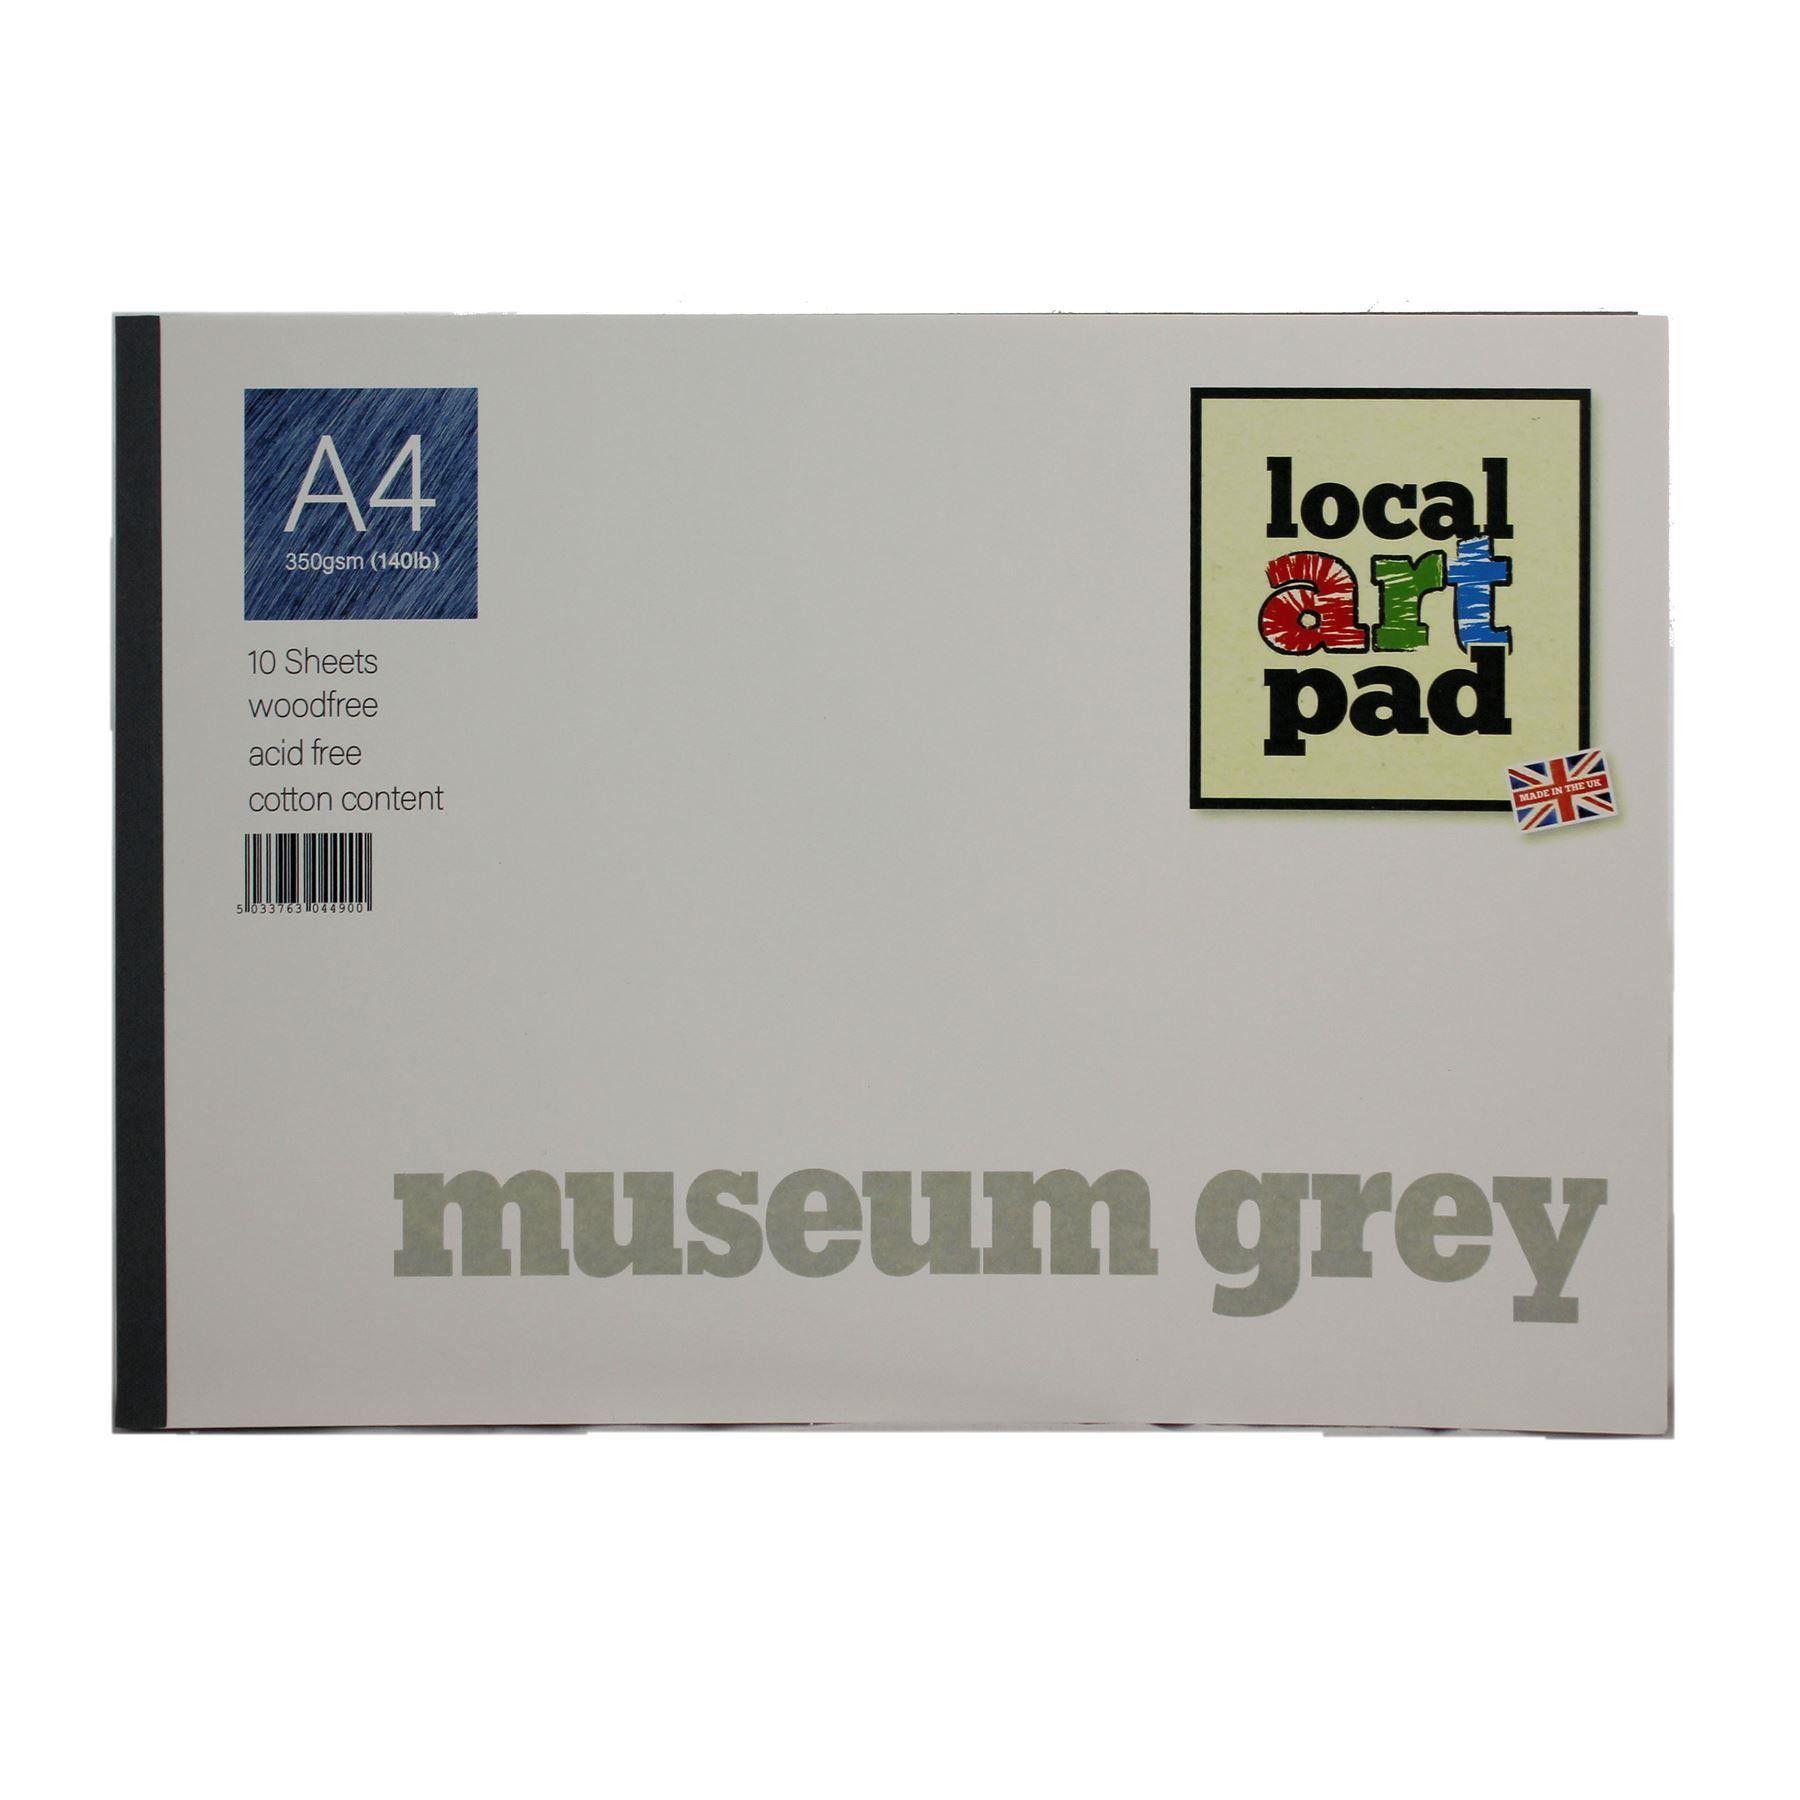 Local Art Pad Museum Grey A4 Grey Paper Pad 350gsm 10 Sheets Art